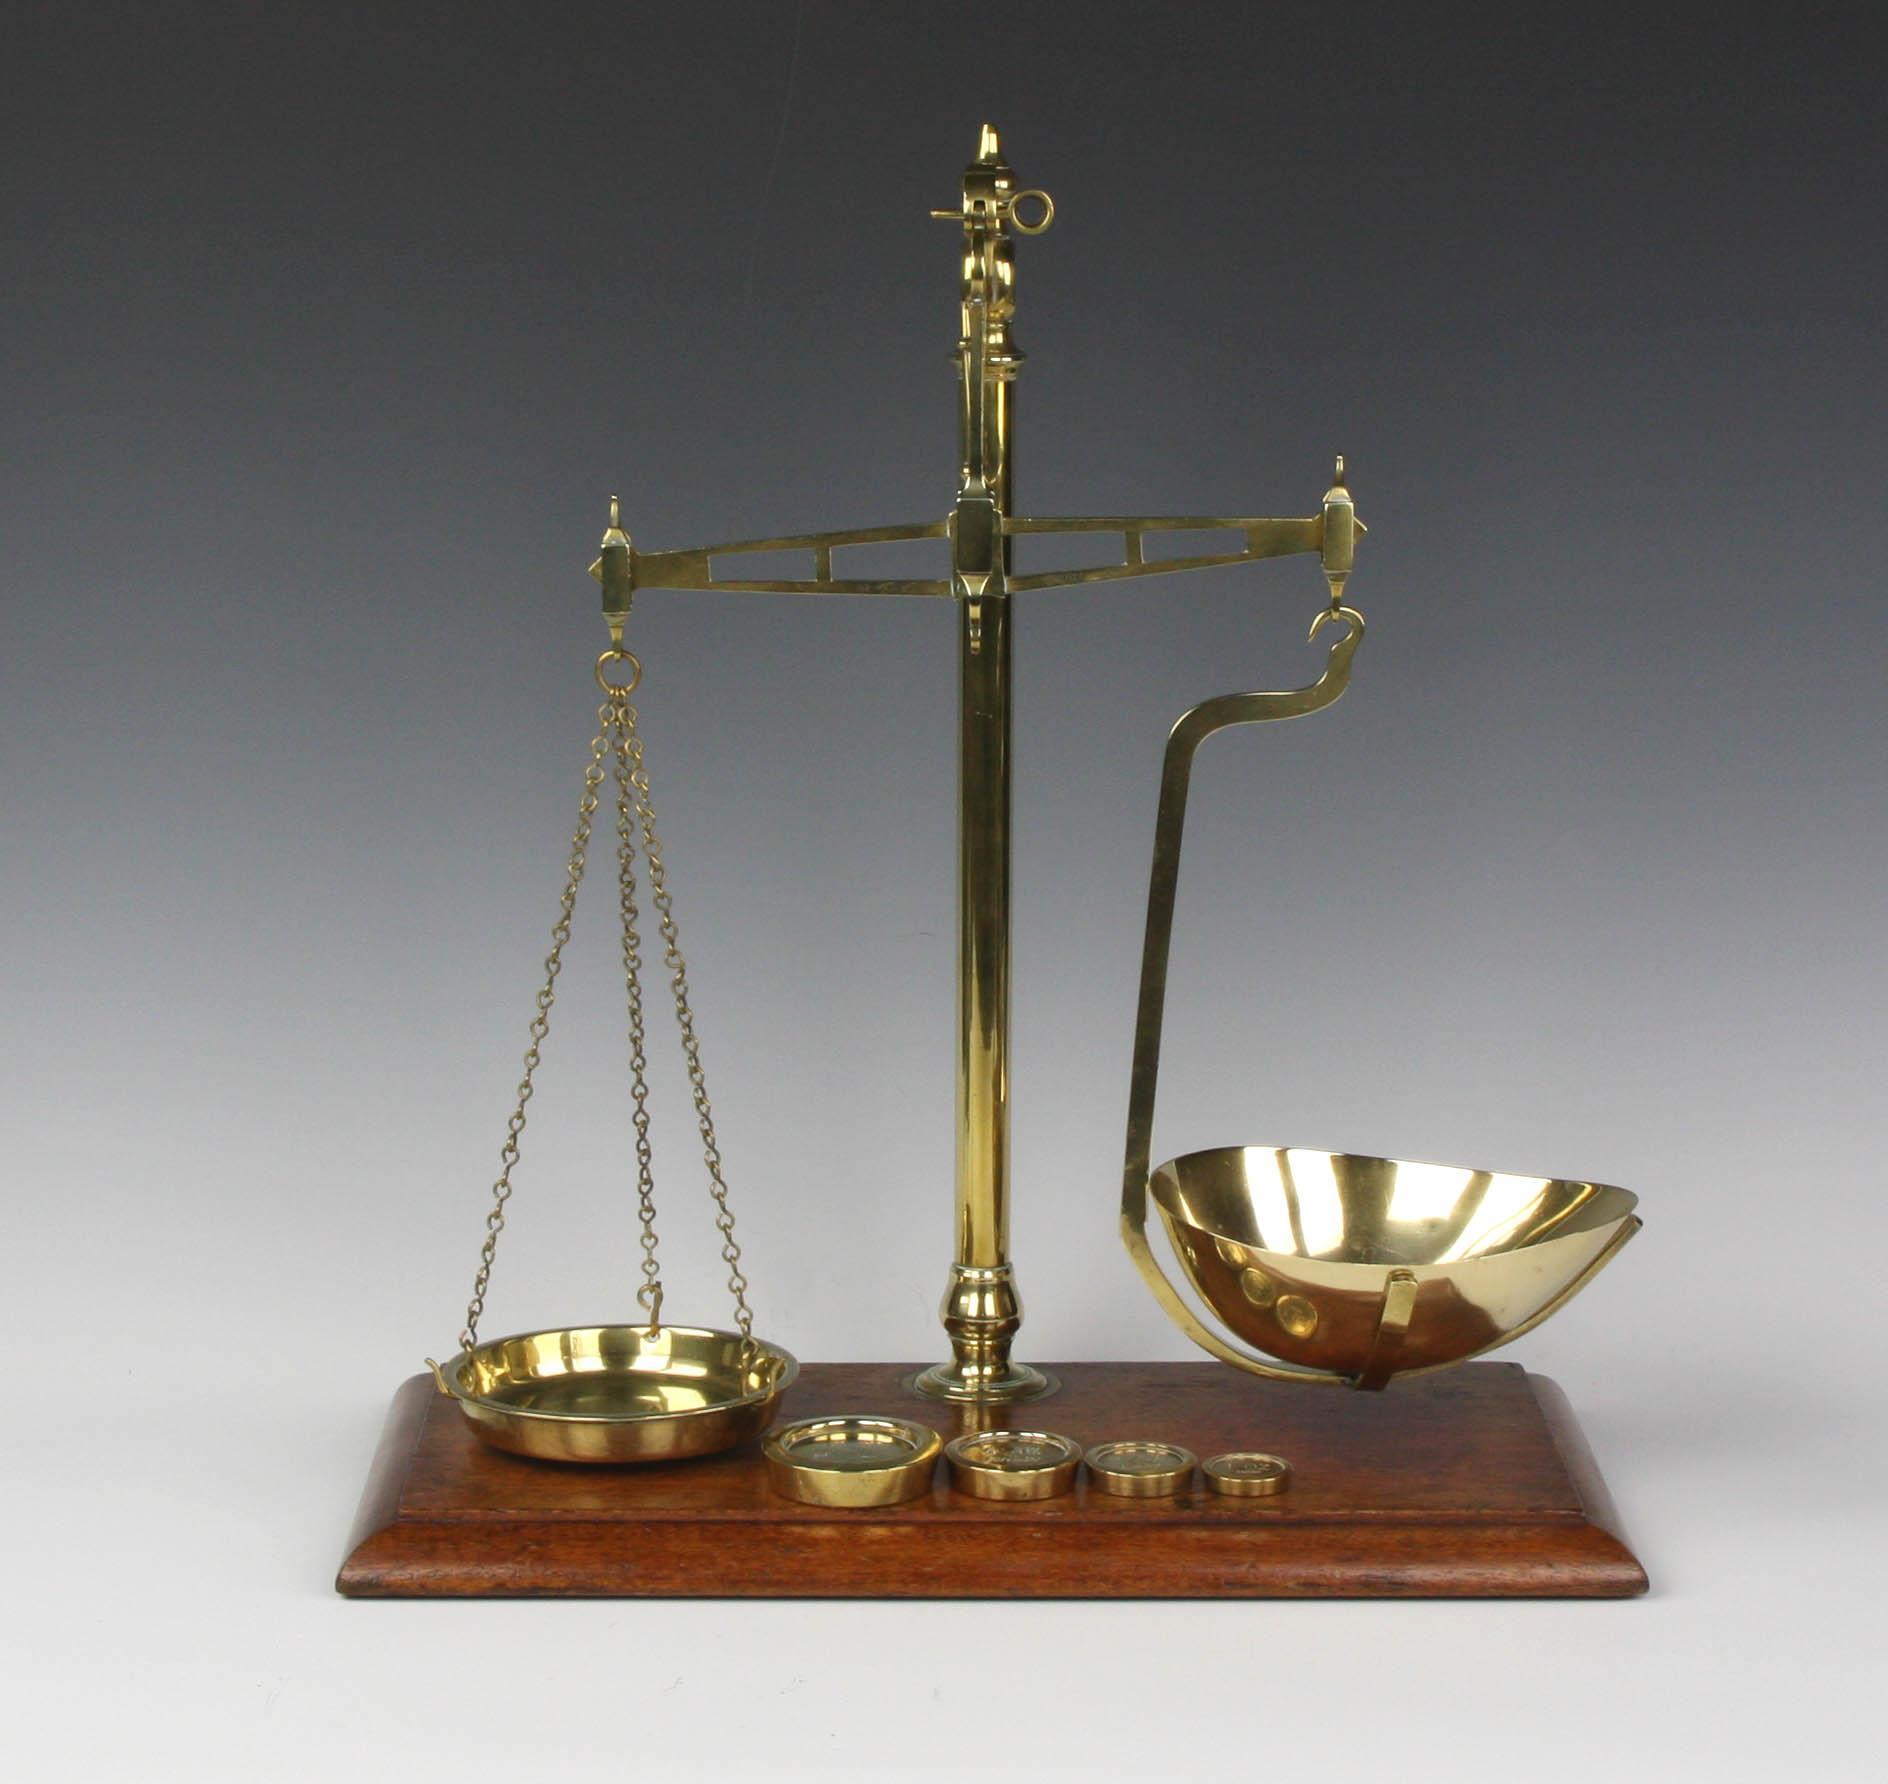 pan balance scale - photo #4